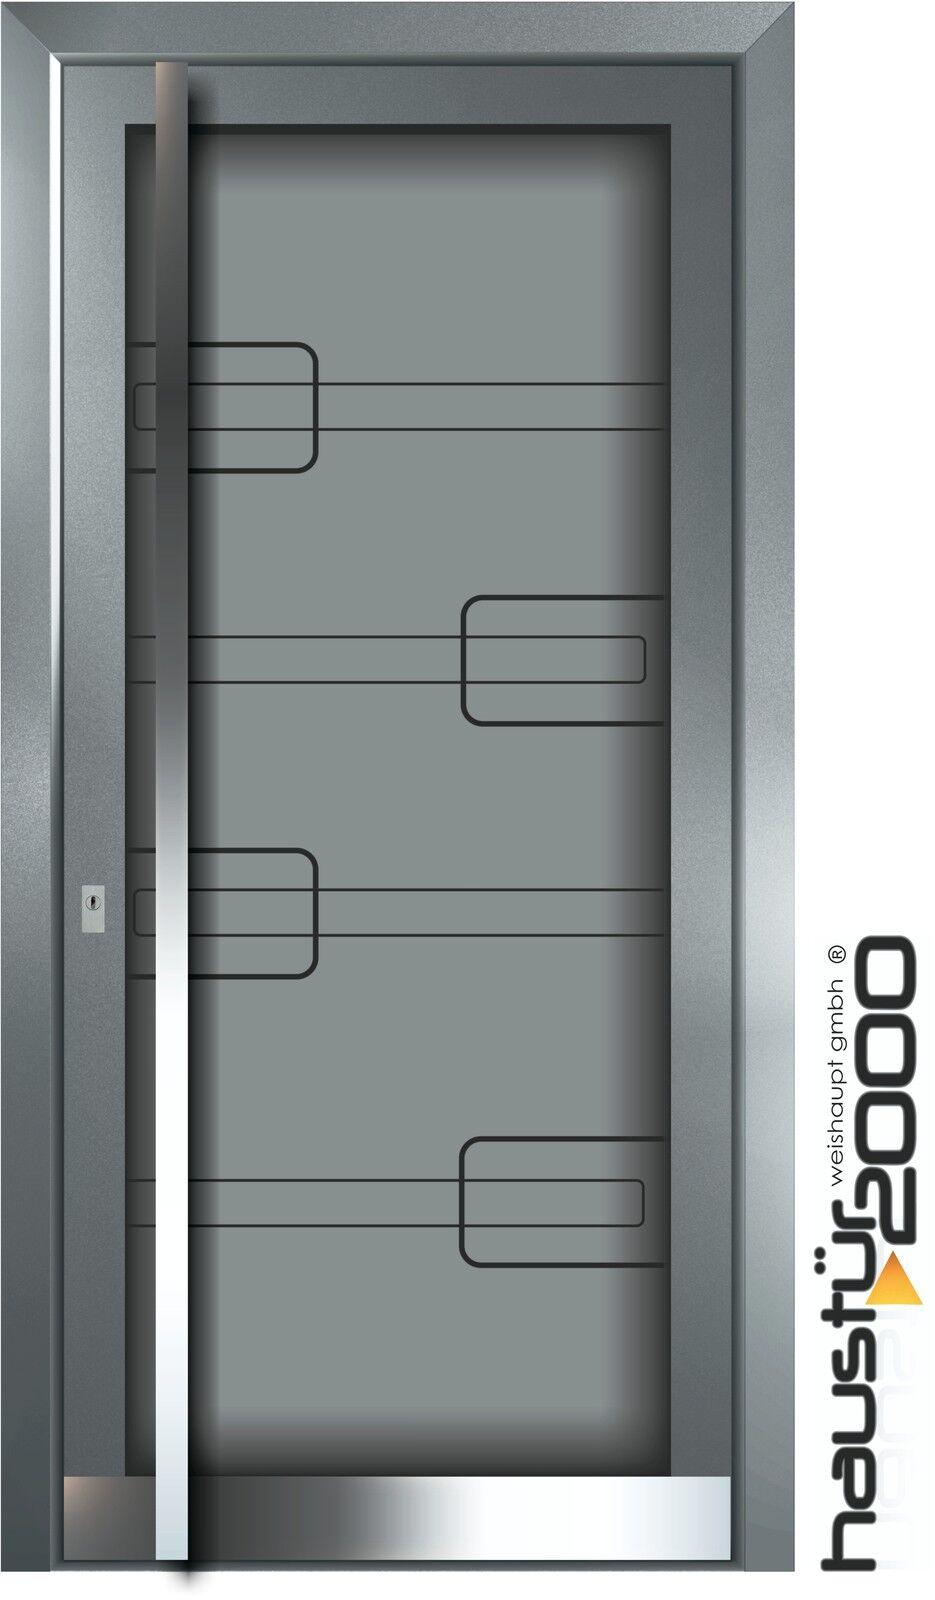 HAUSTÜR2000® Aluminium Haustür Glas Tür Alu Haustüren nach Maß Mod. HT 6514 GLA